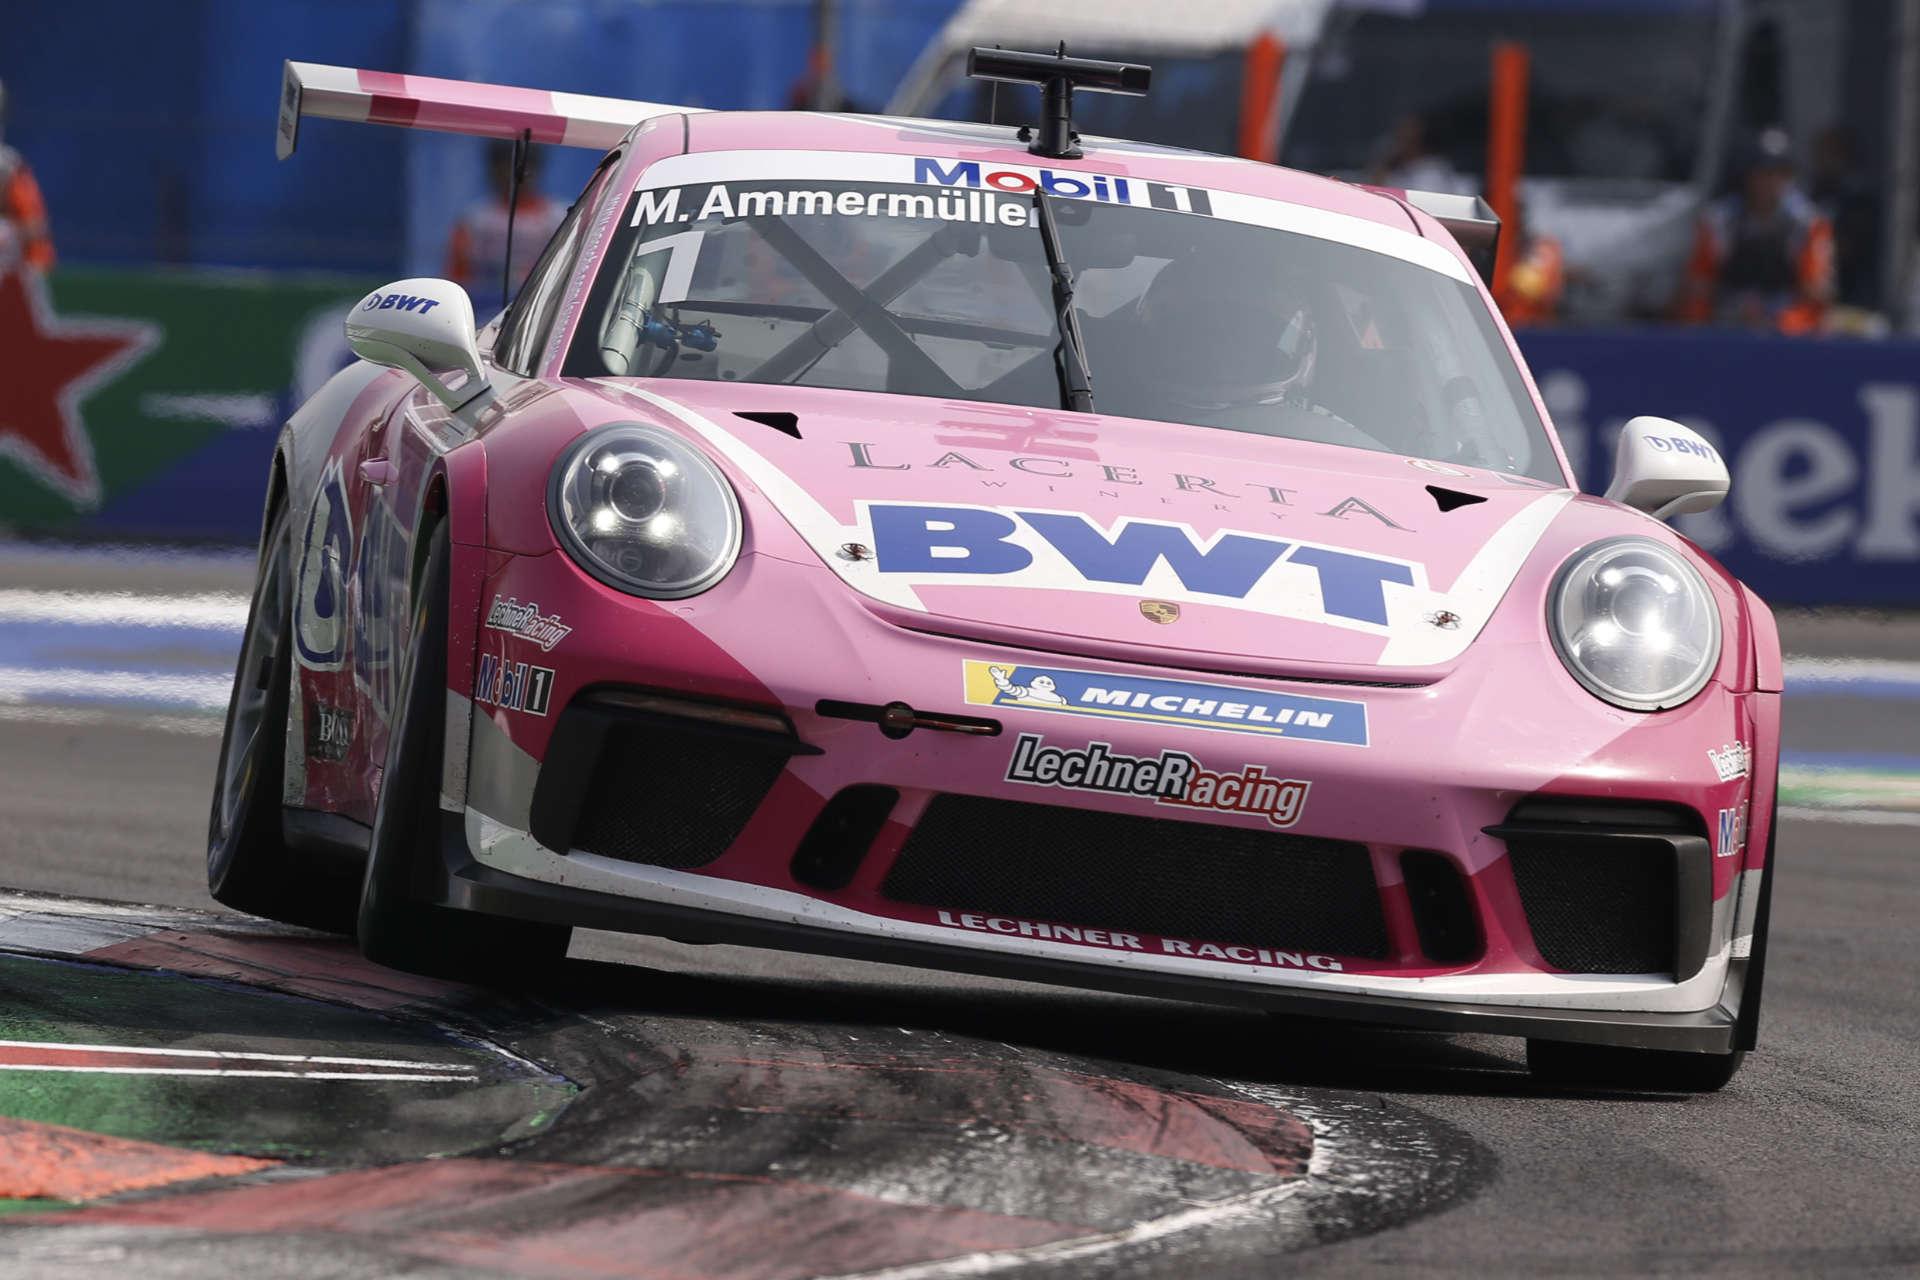 Michael Ammermüller BWT Lechner Racing